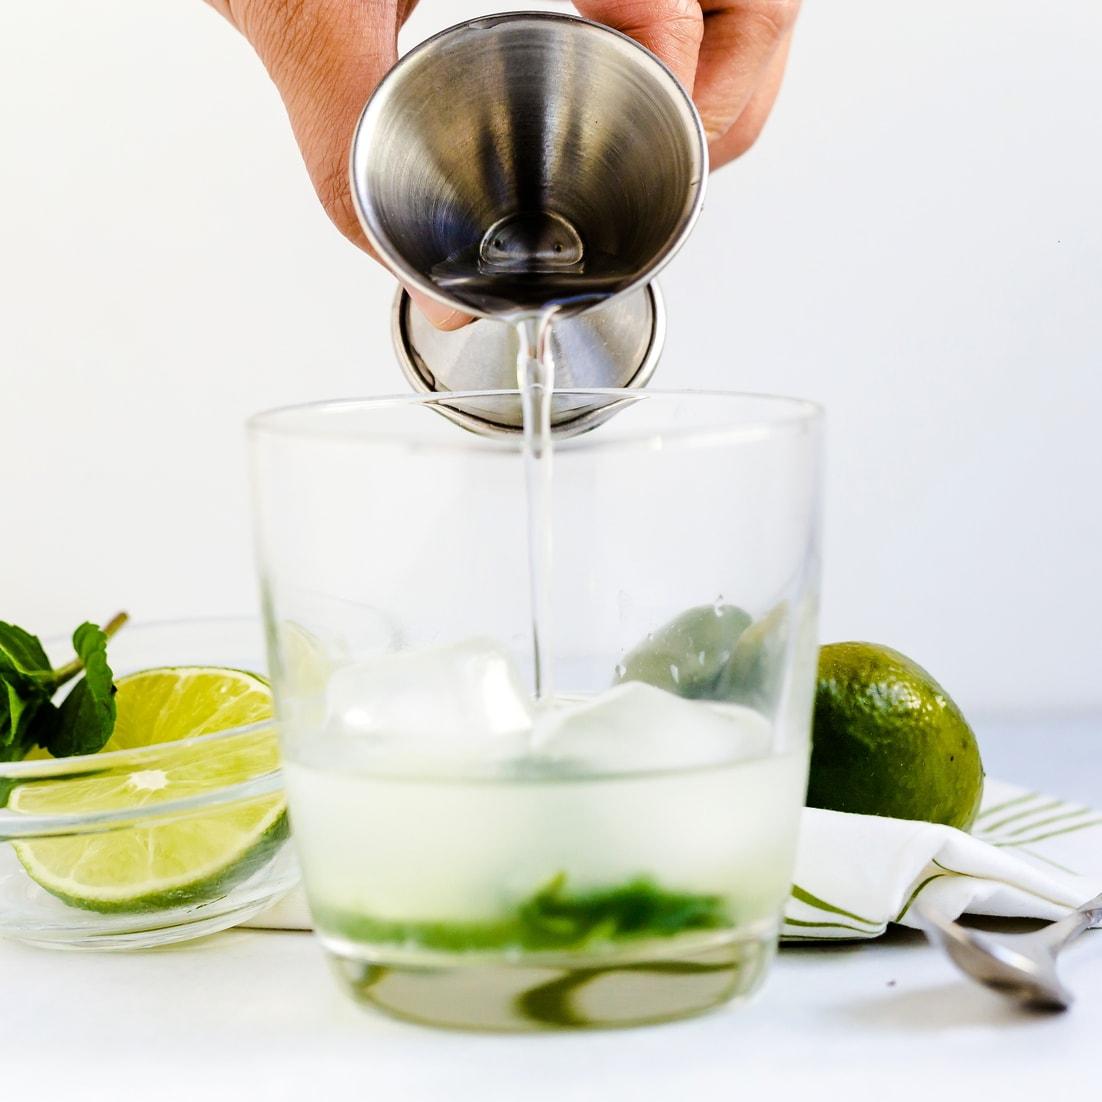 White rum being poured to make keto mojito